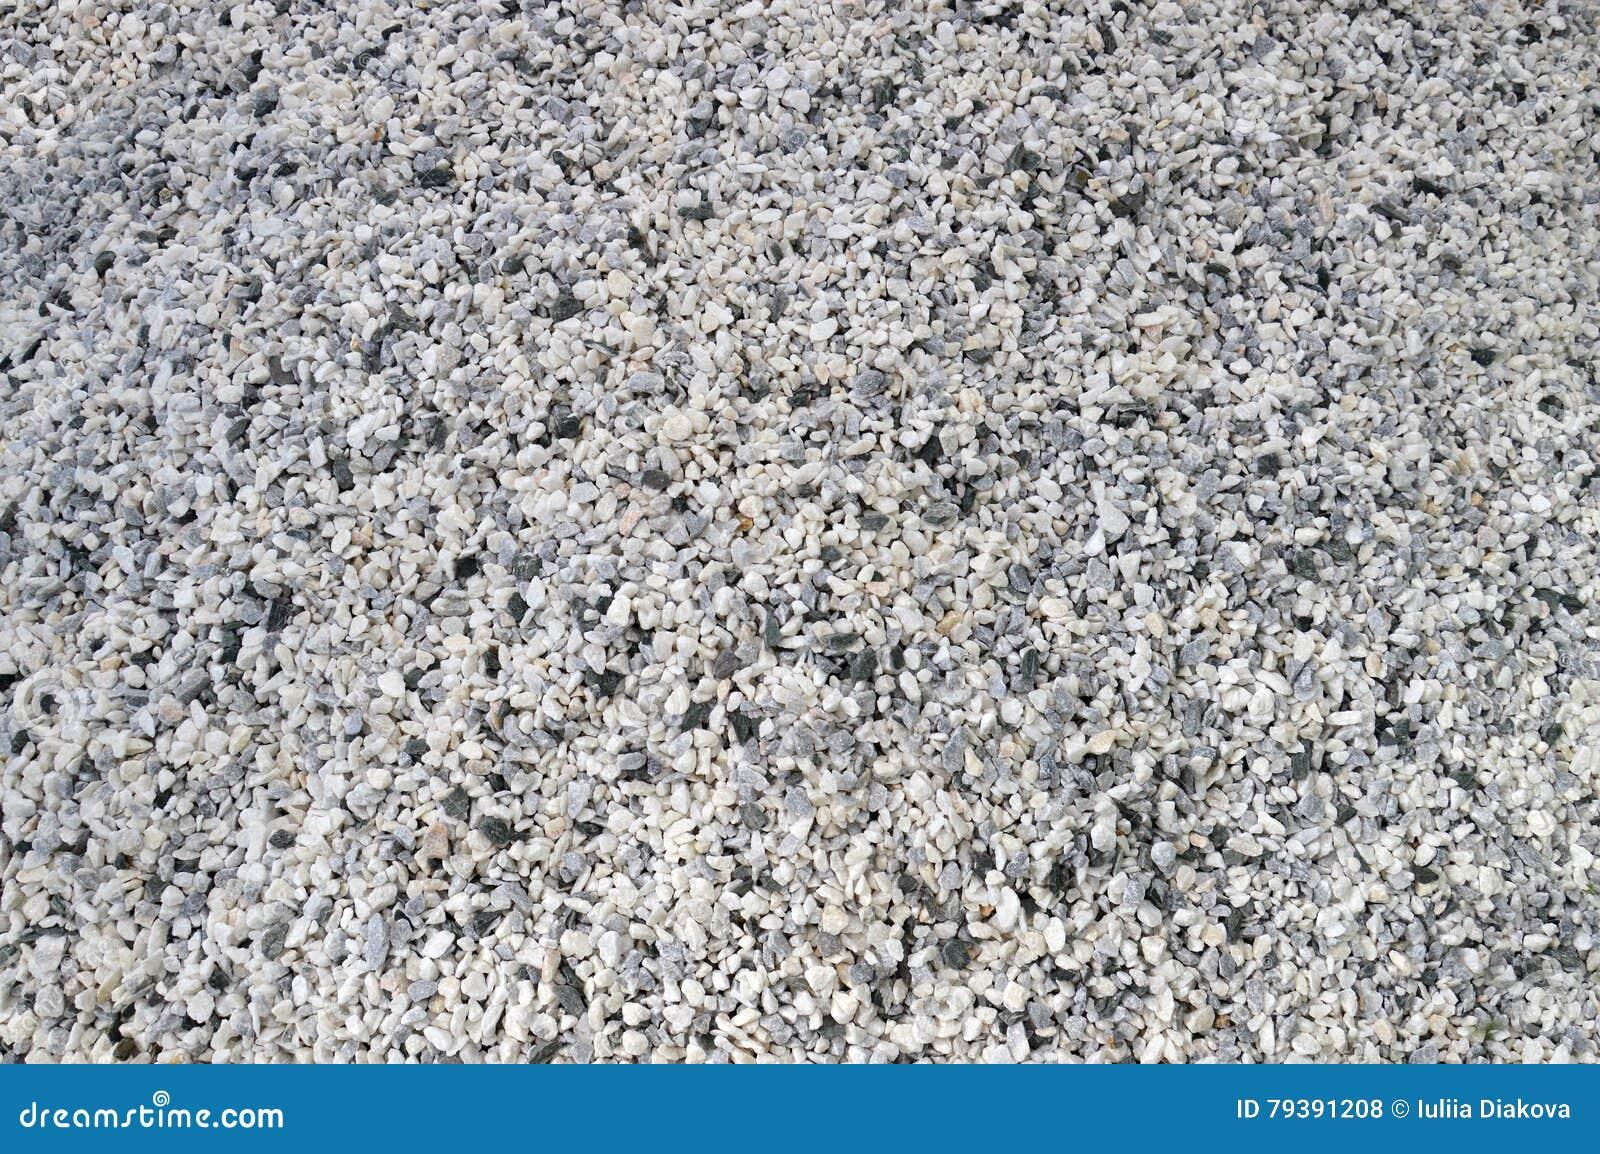 Marble Natural Resource Description